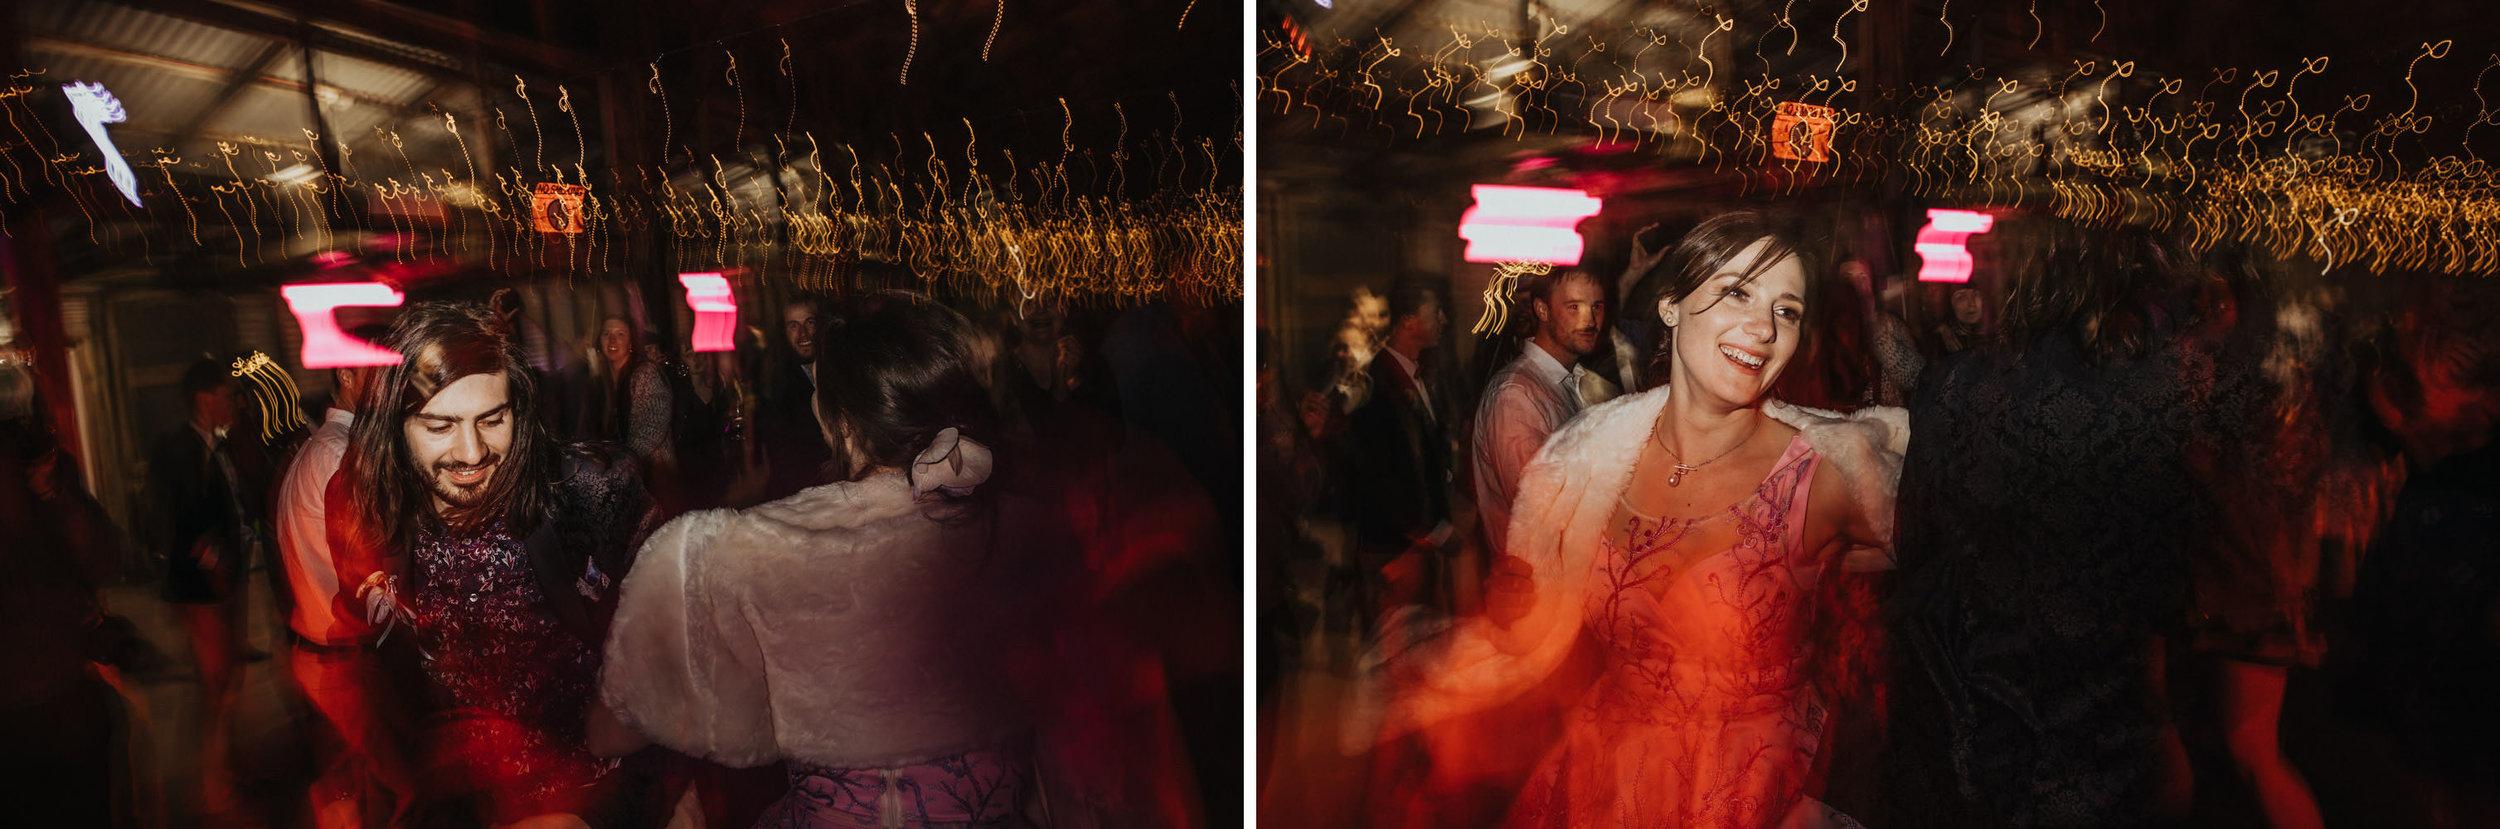 alternative-wedding-australia-non-traditional_127.jpg